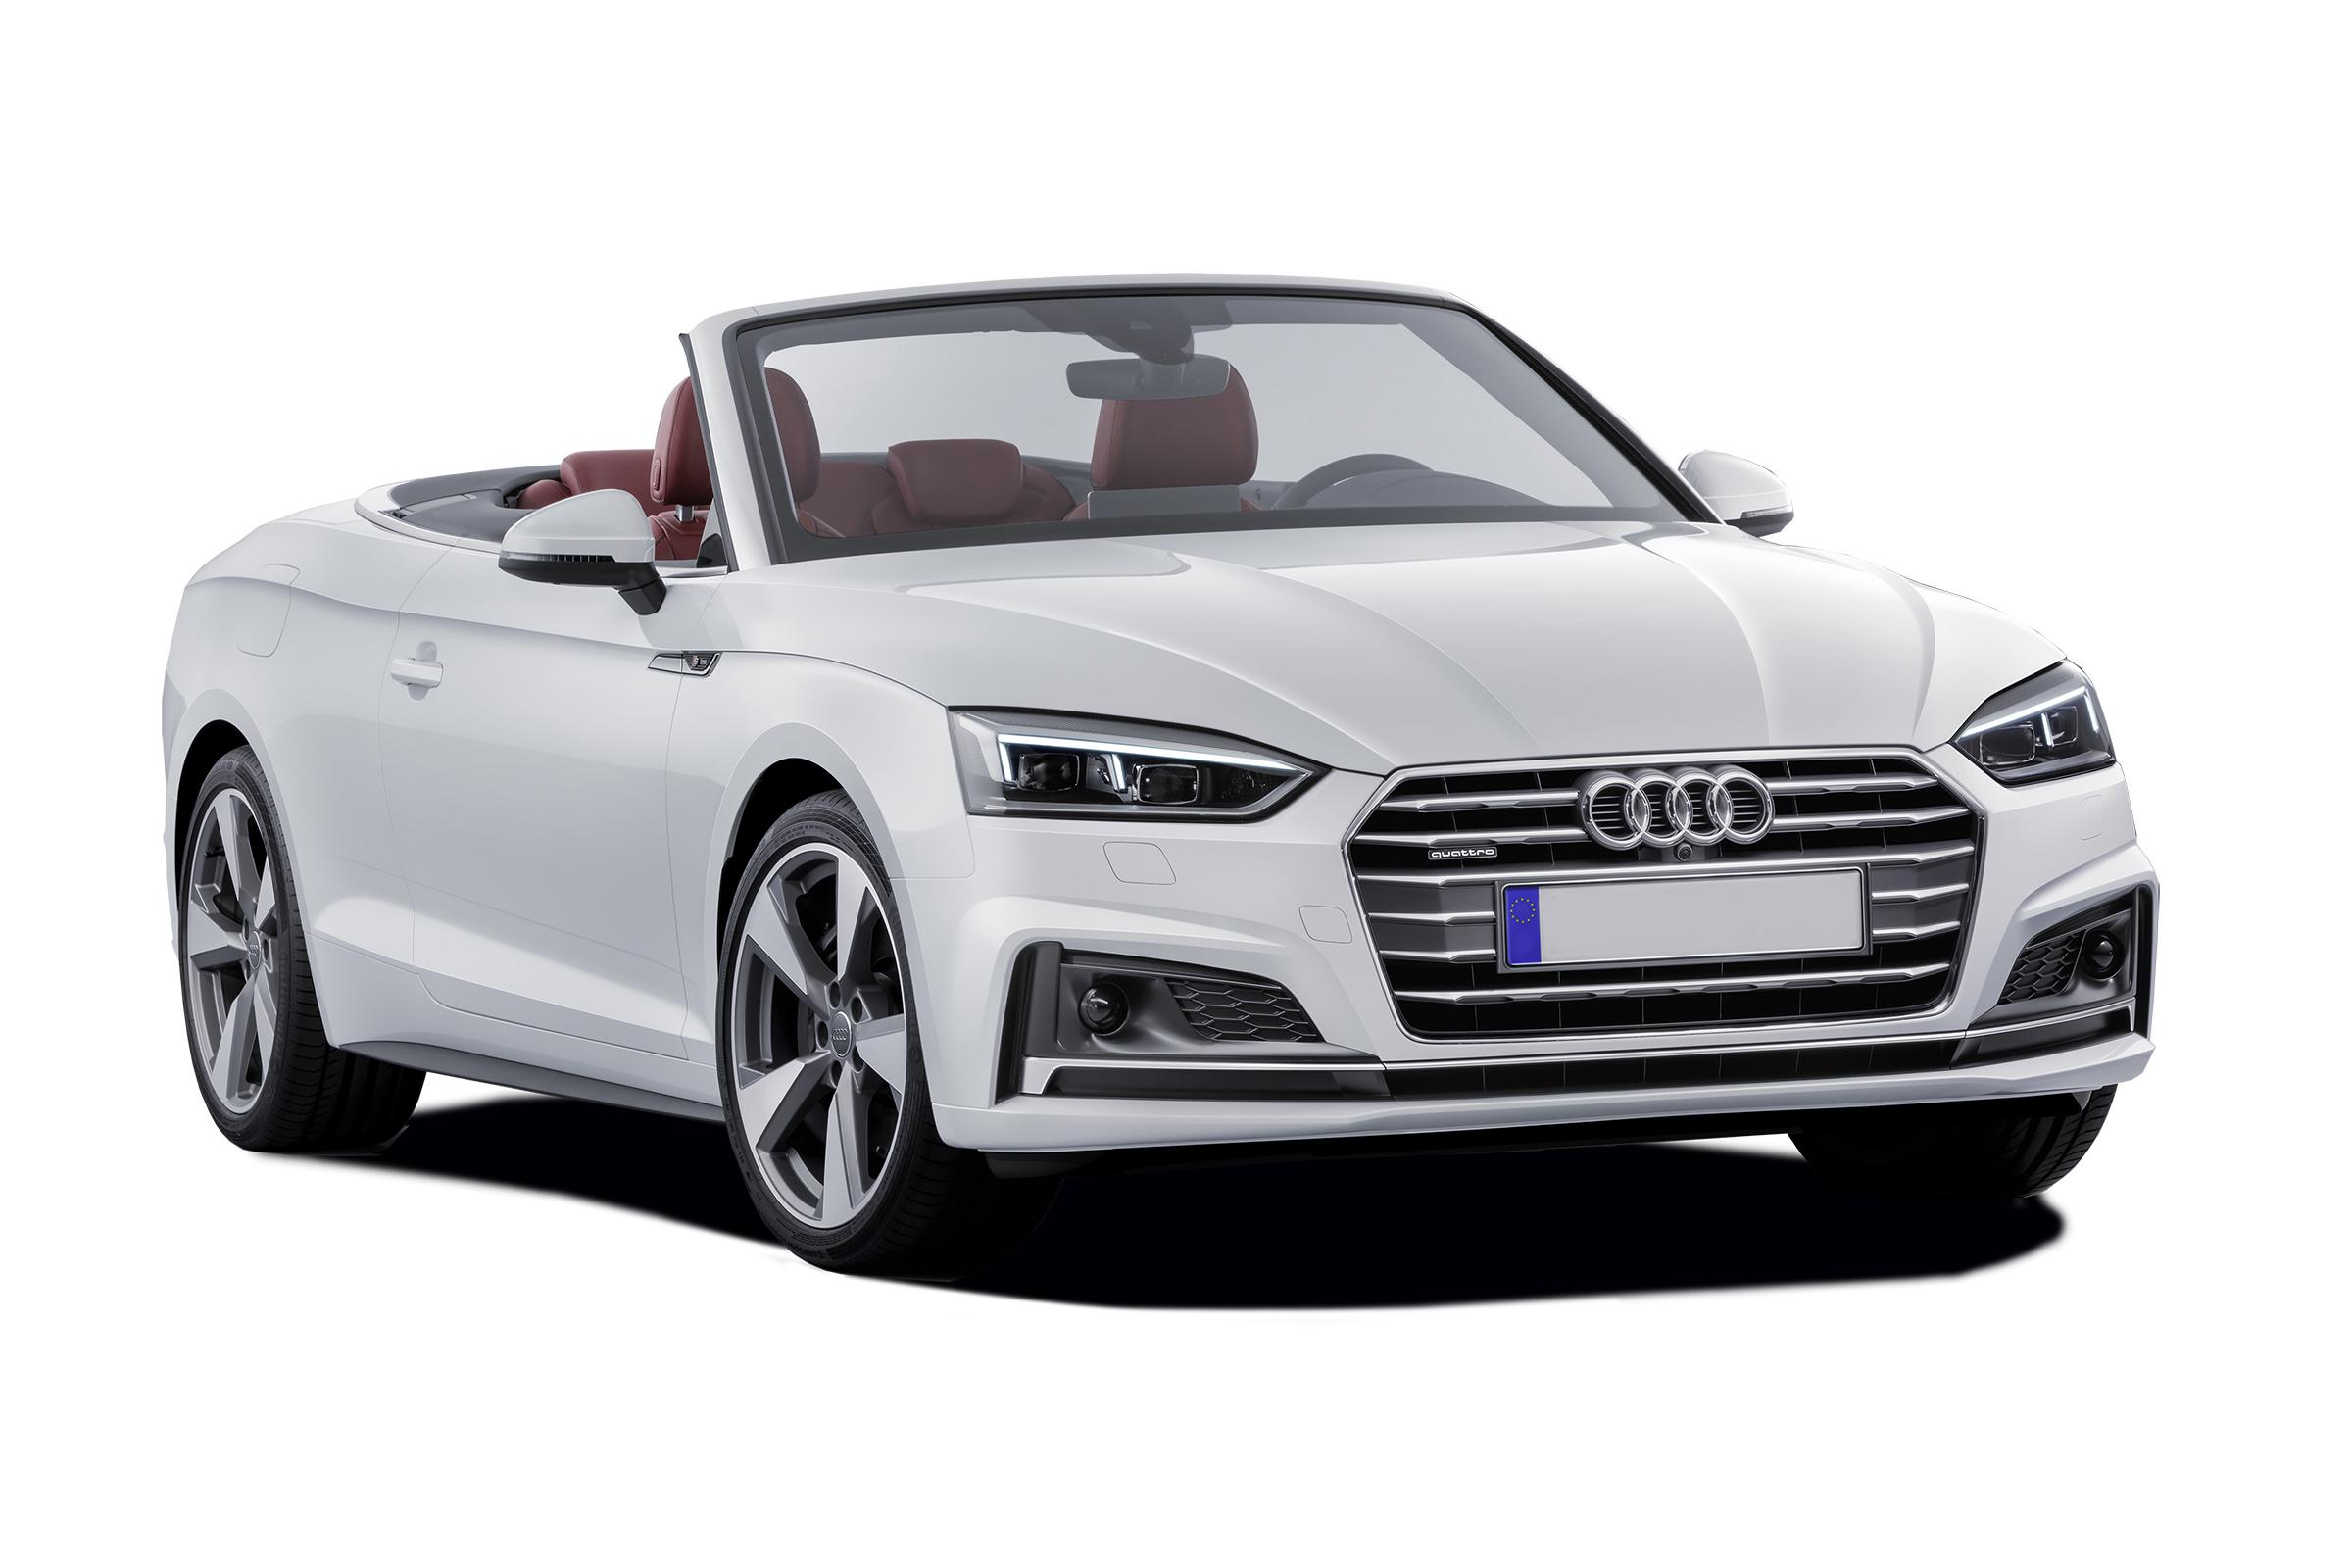 Audi A5 Cabriolet 2020 Review Carbuyer